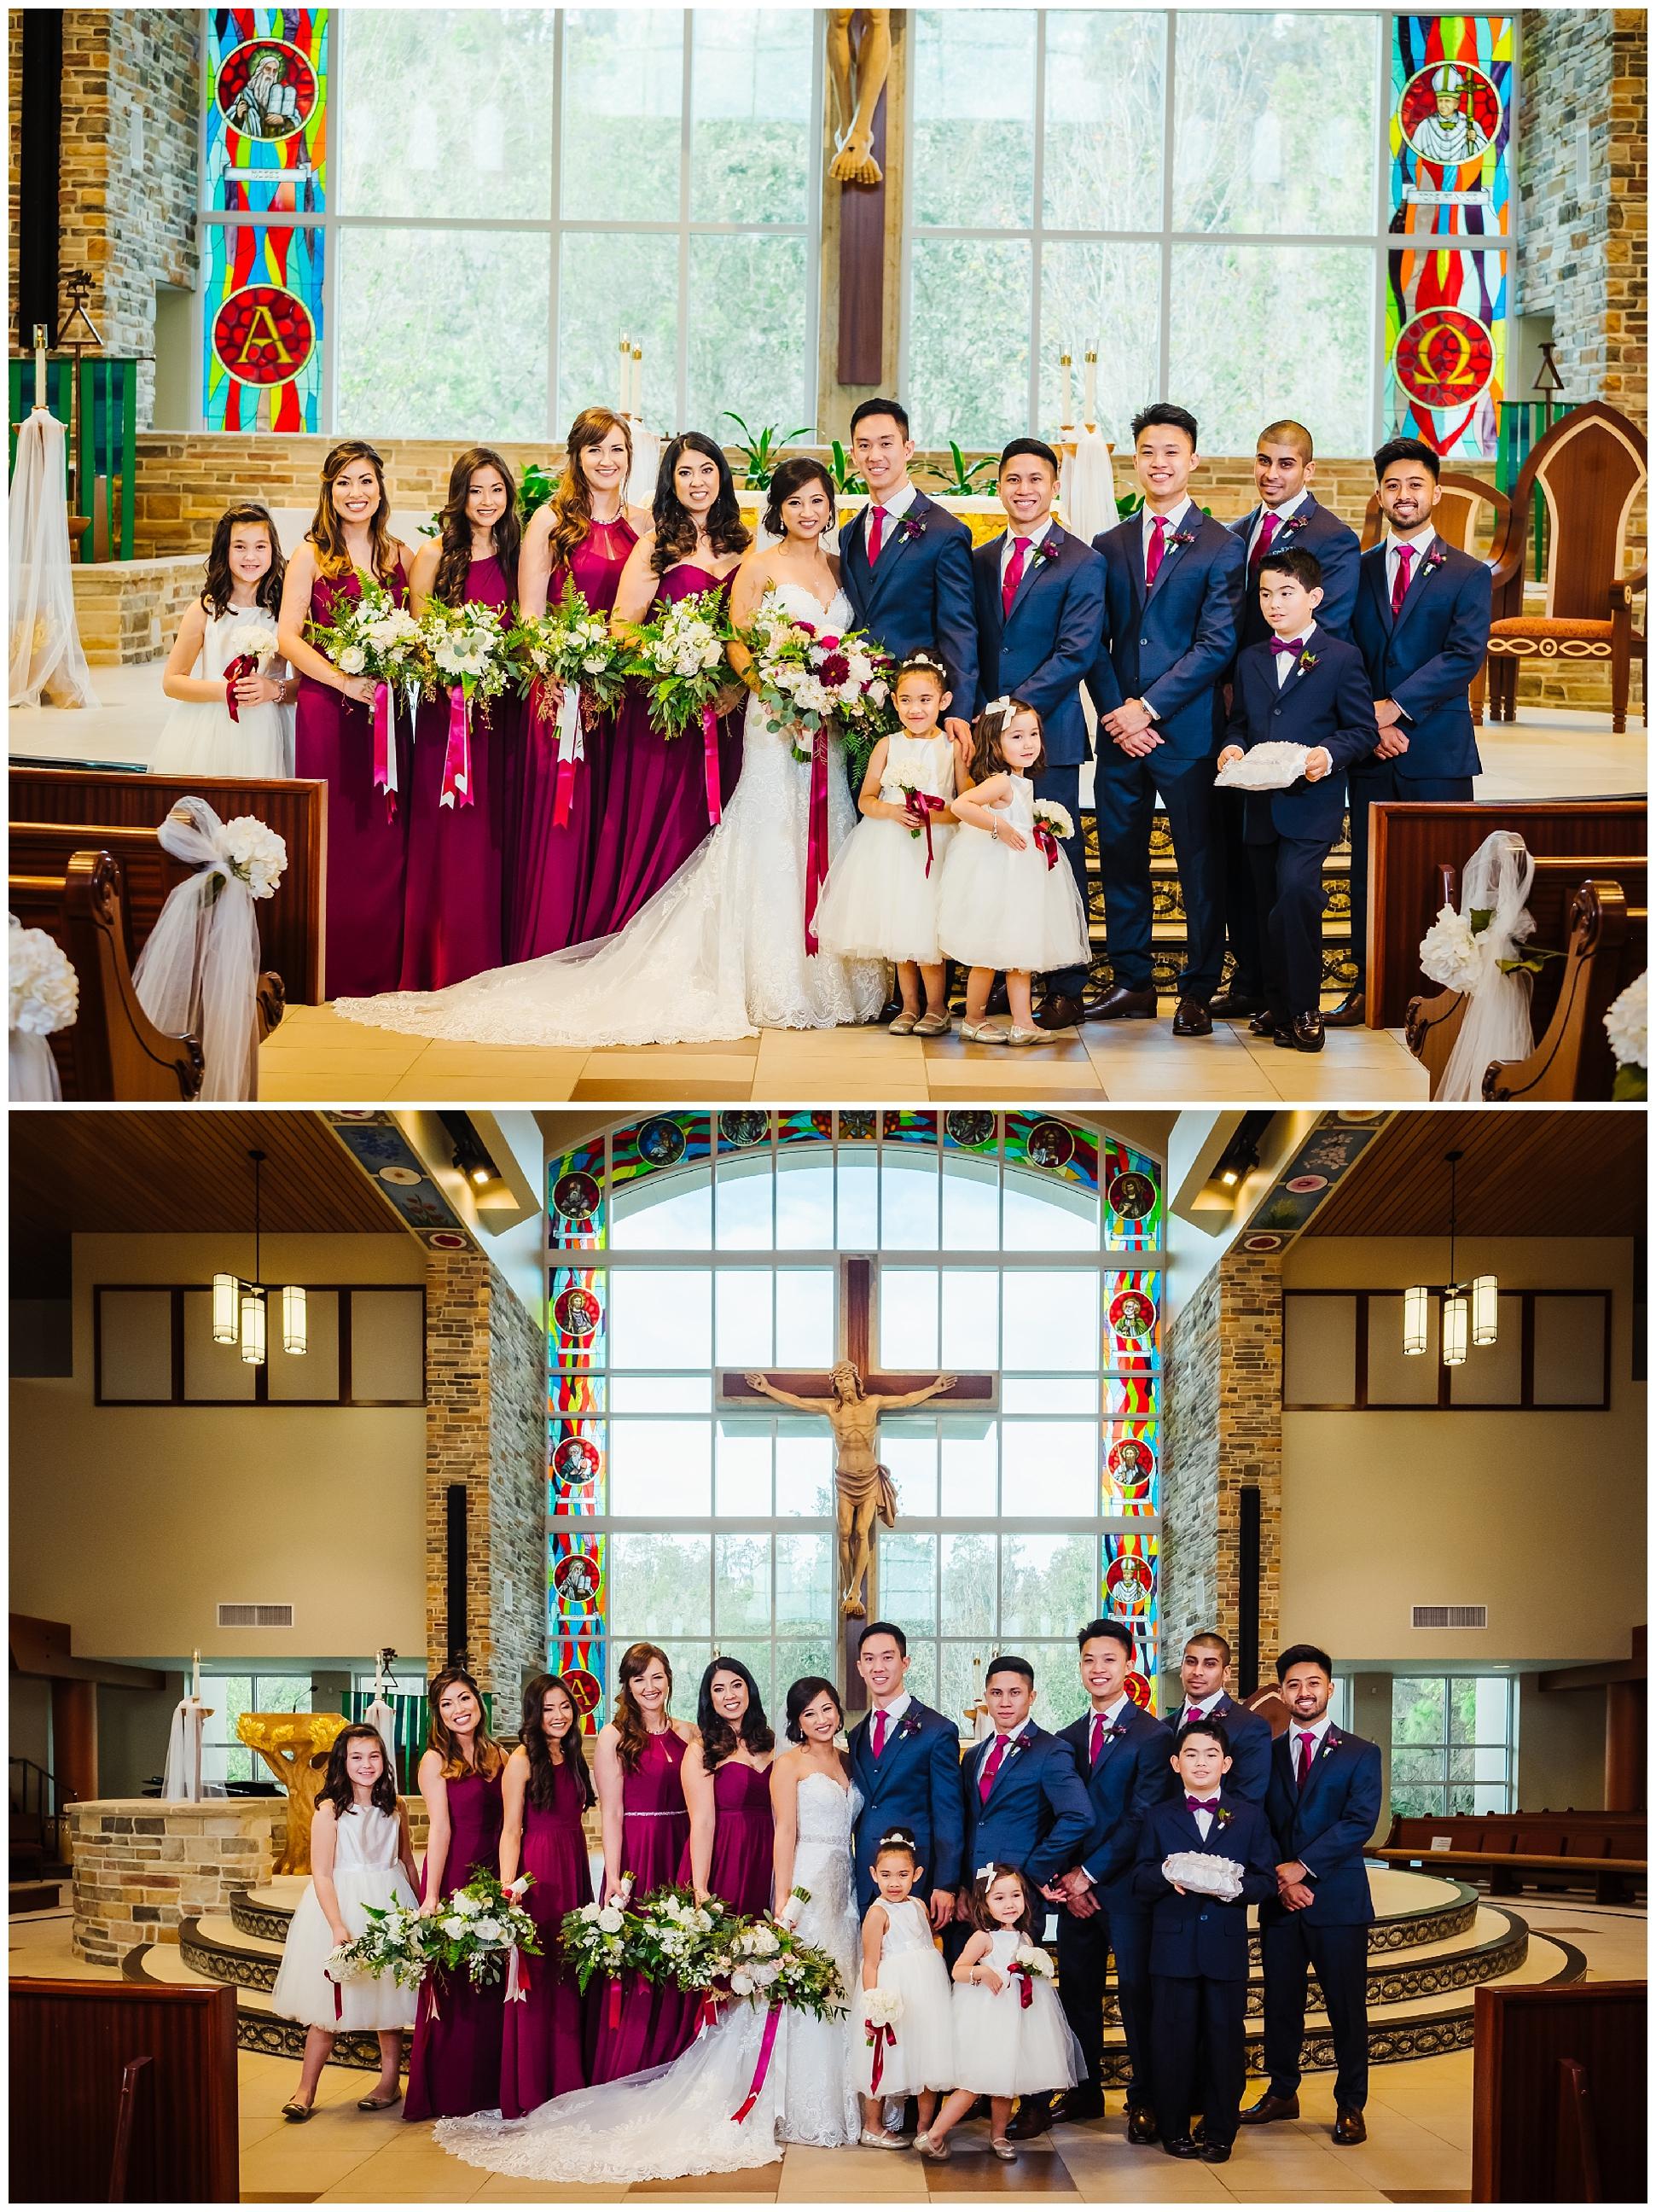 tampa-wedding-photographer-philipino-colorful-woods-ballroom-church-mass-confetti-fuscia_0039.jpg